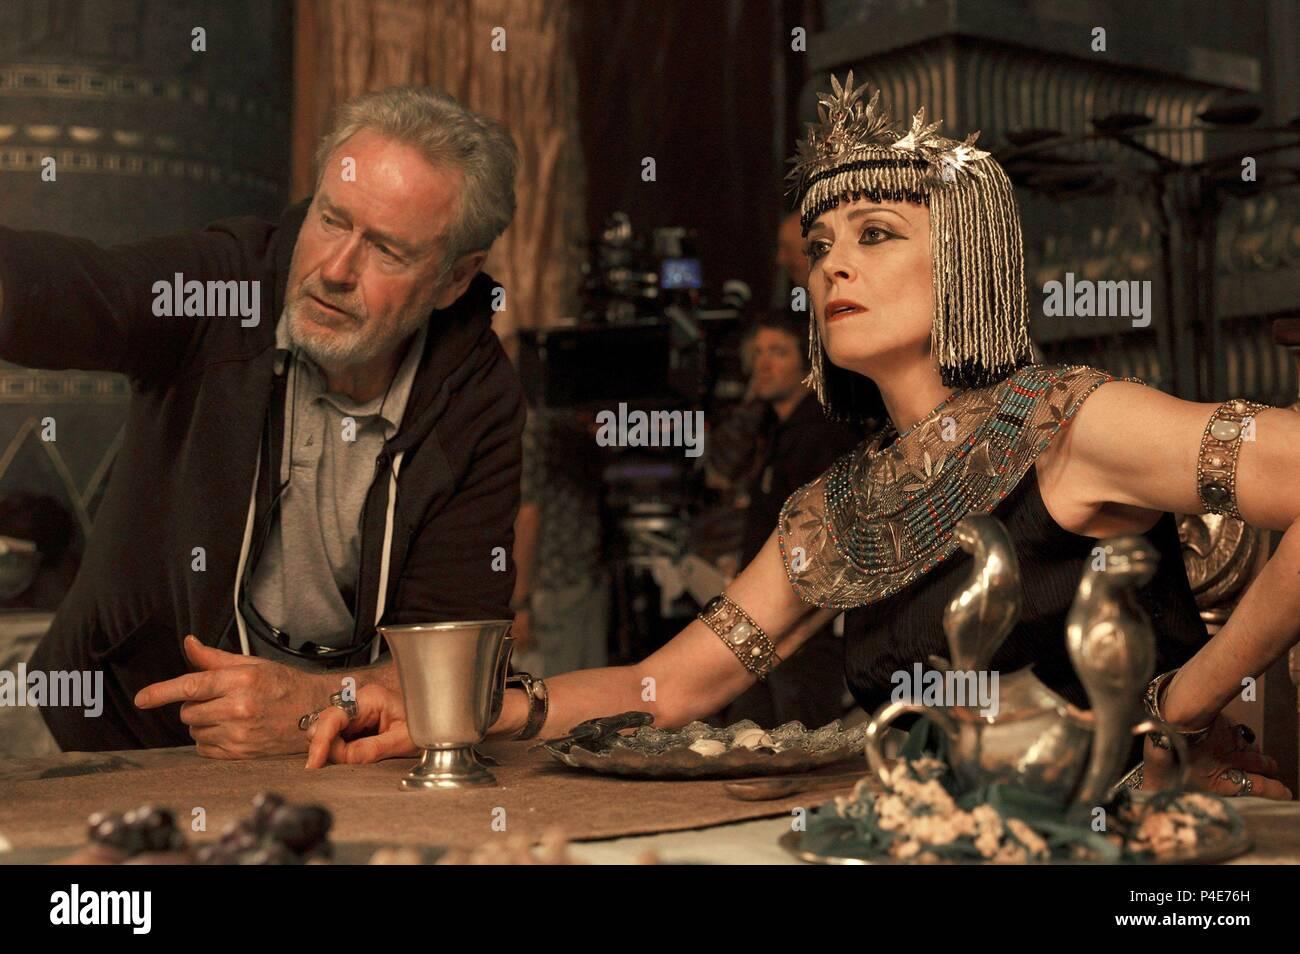 Original Film Title: EXODUS: GODS AND KINGS.  English Title: EXODUS: GODS AND KINGS.  Film Director: RIDLEY SCOTT.  Year: 2014.  Stars: SIGOURNEY WEAVER; RIDLEY SCOTT. Credit: CHERNIN ENTERTAINMENT / Album - Stock Image